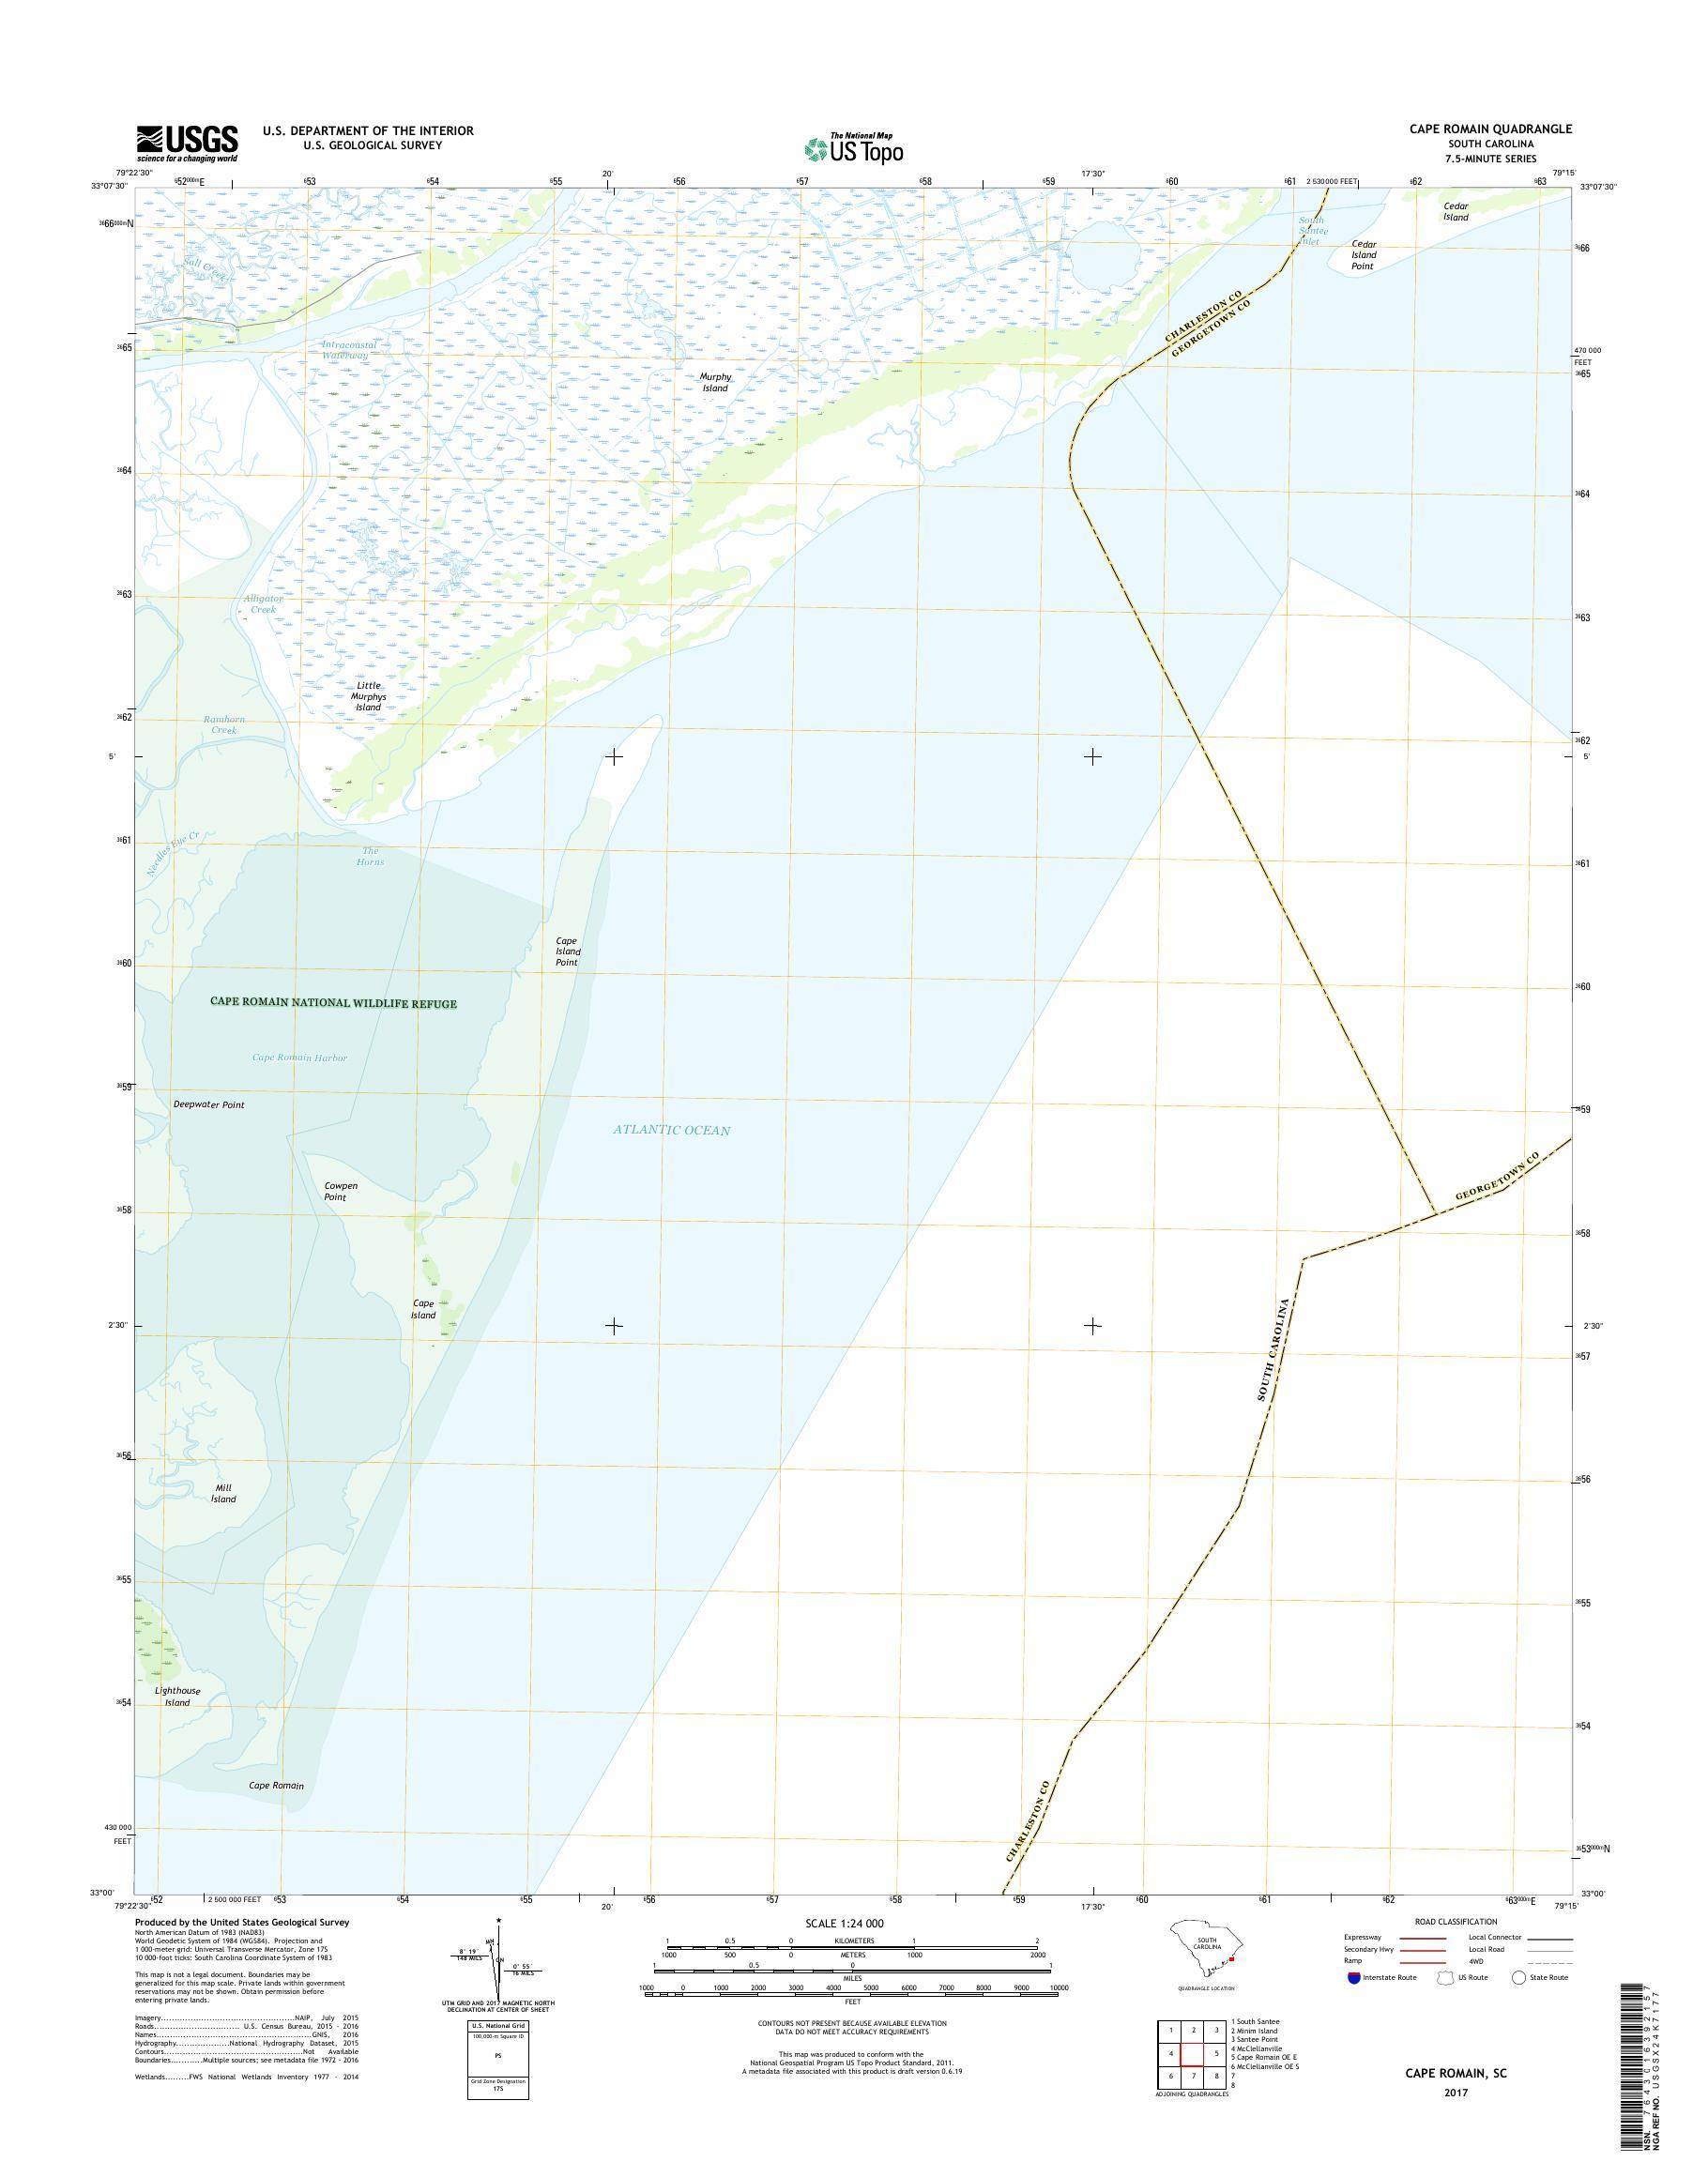 MyTopo Cape Romain, South Carolina USGS Quad Topo Map